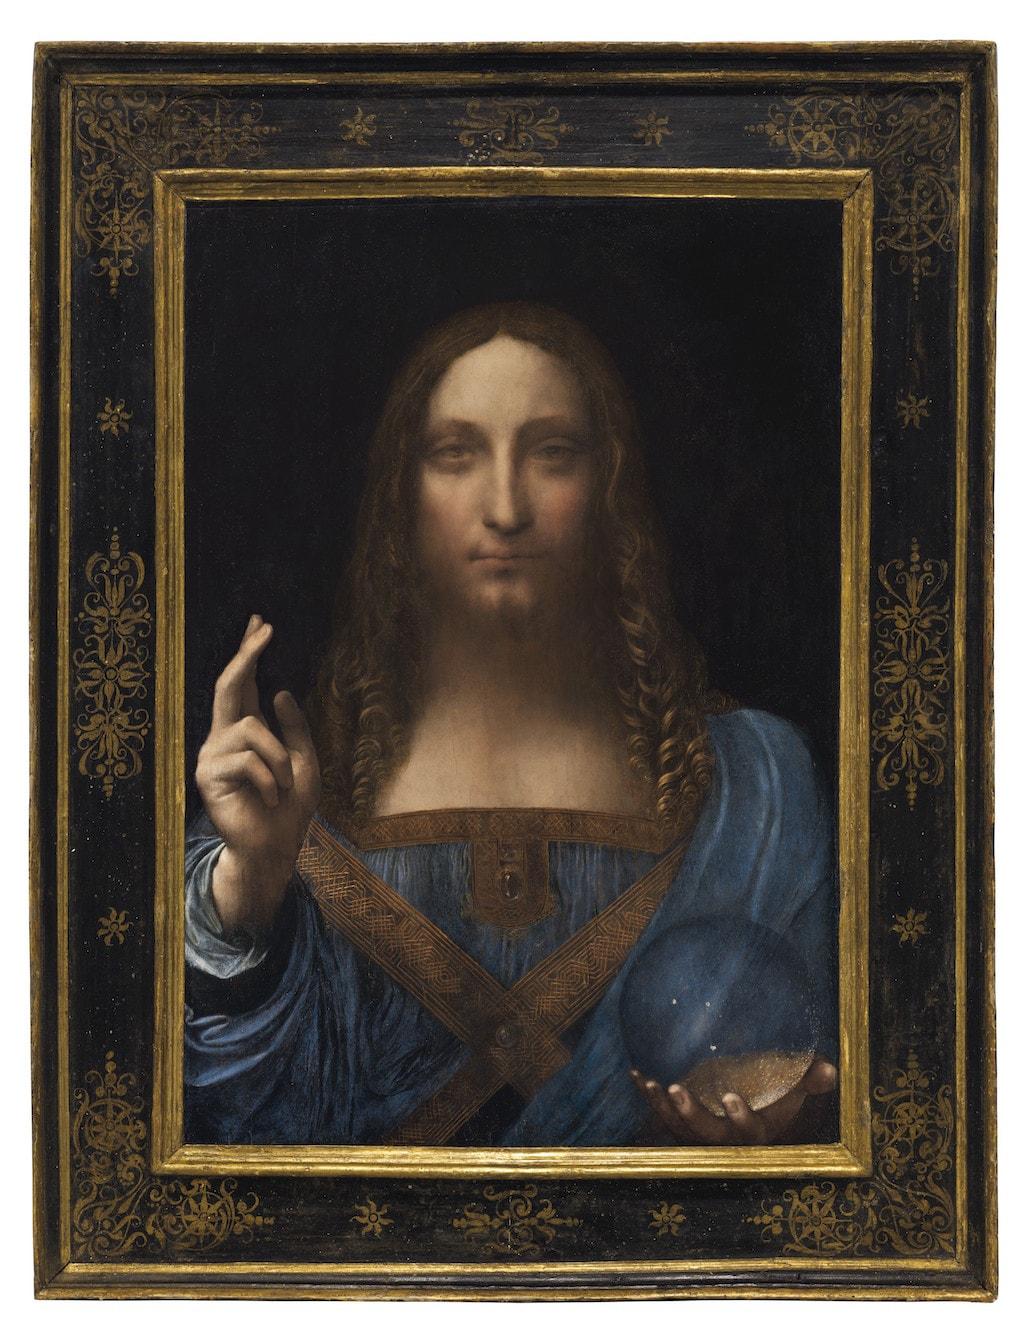 Leonardo da Vinci, 'Salvator Mundi', ca. 1500 | © Christie's Images Ltd. 2017